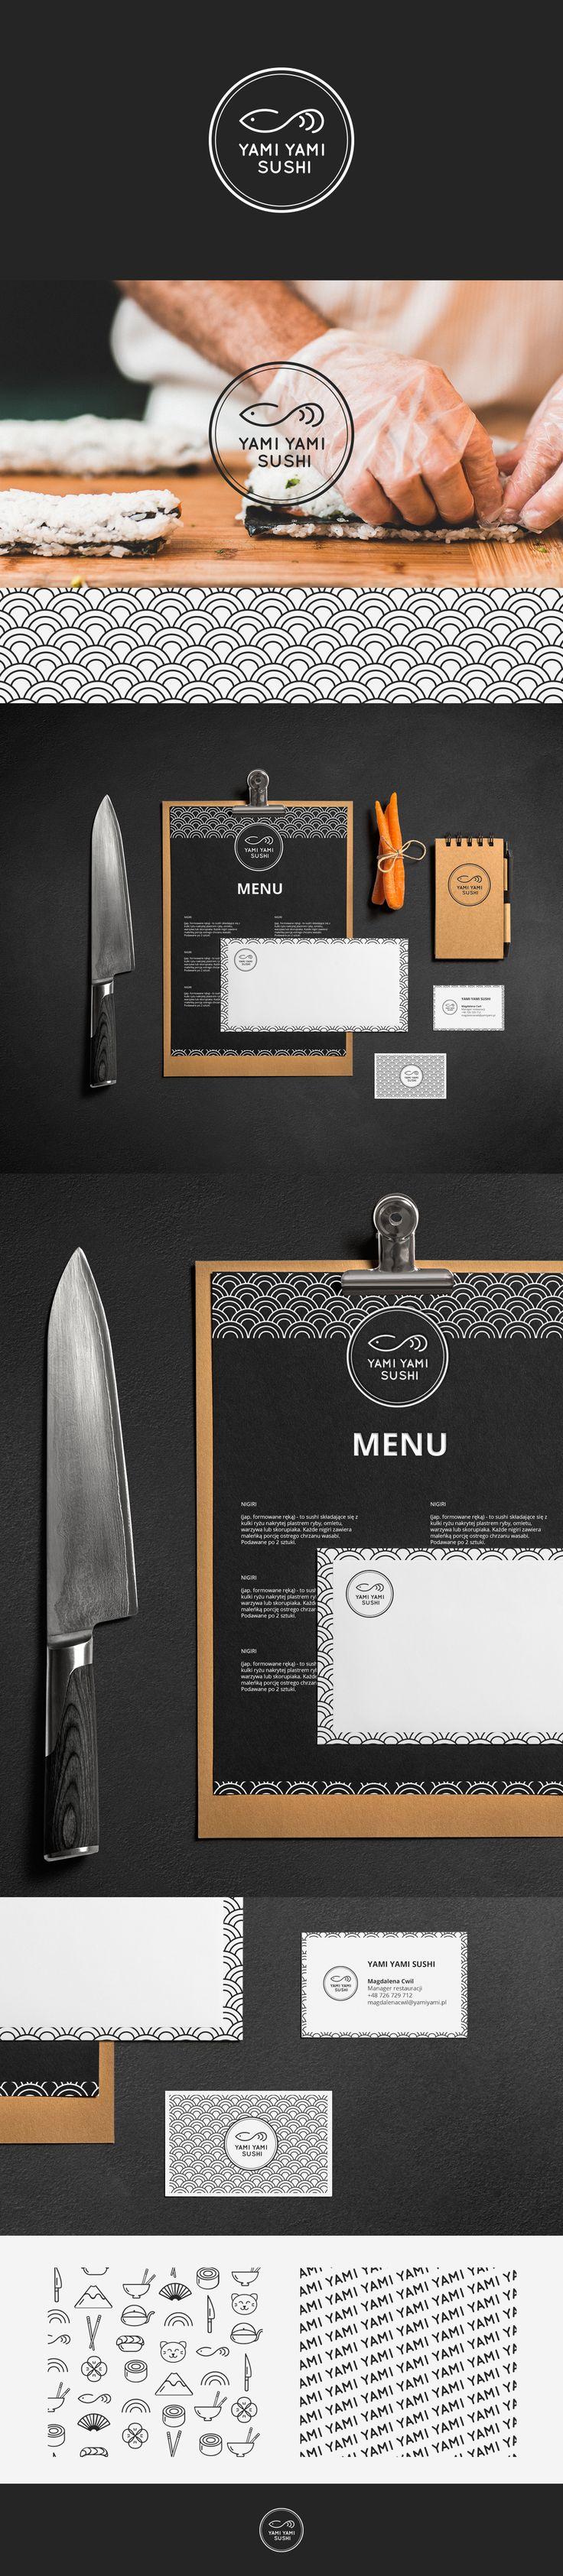 "Check out this @Behance project: ""Yami Yami Sushi Branding"" https://www.behance.net/gallery/42069019/Yami-Yami-Sushi-Branding"